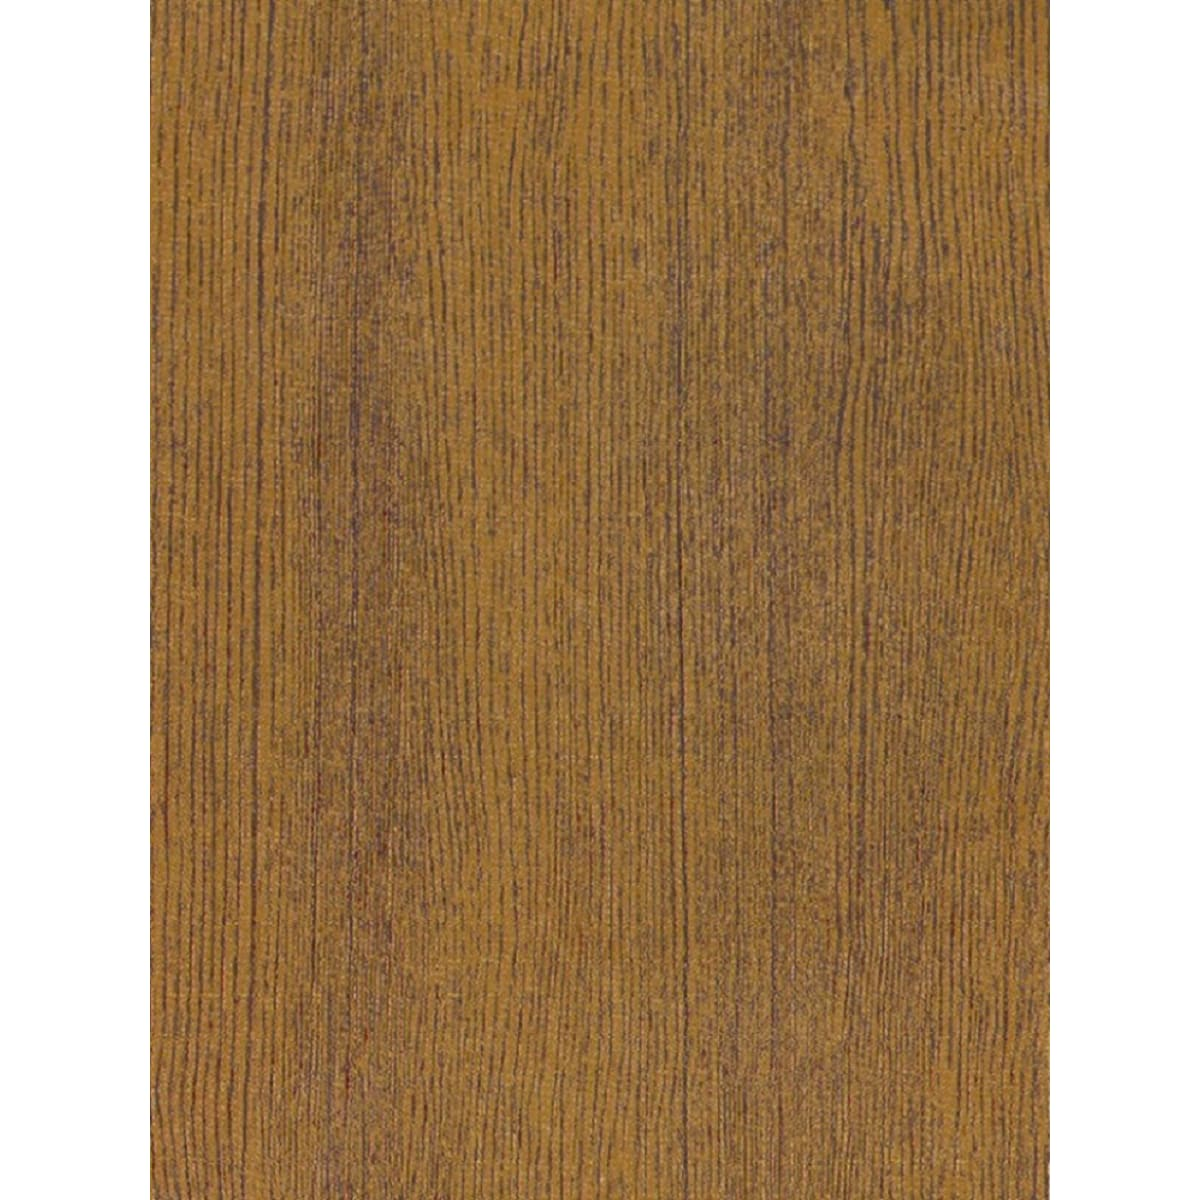 Декоративная самоклеящаяся пленка Color Decor 8009х12 0,675